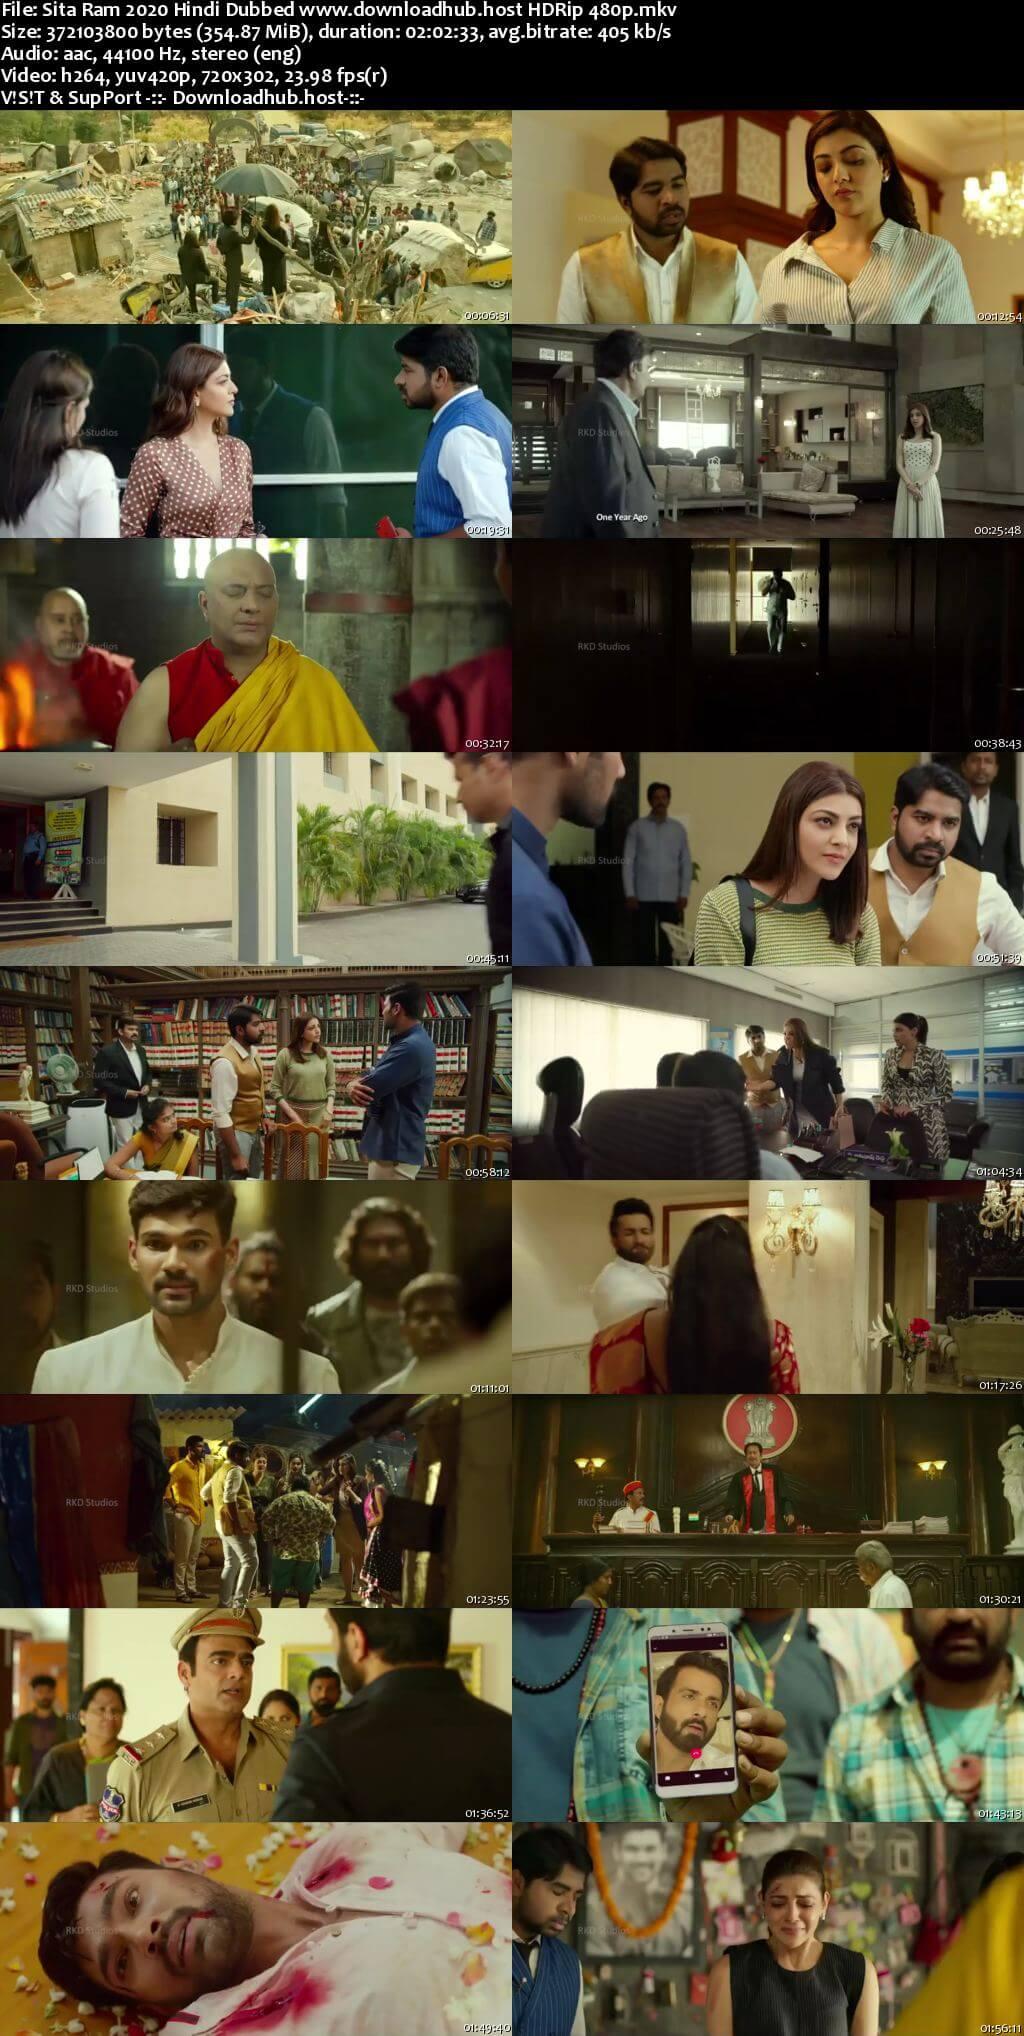 Sita Ram 2020 Hindi Dubbed 350MB HDRip 480p